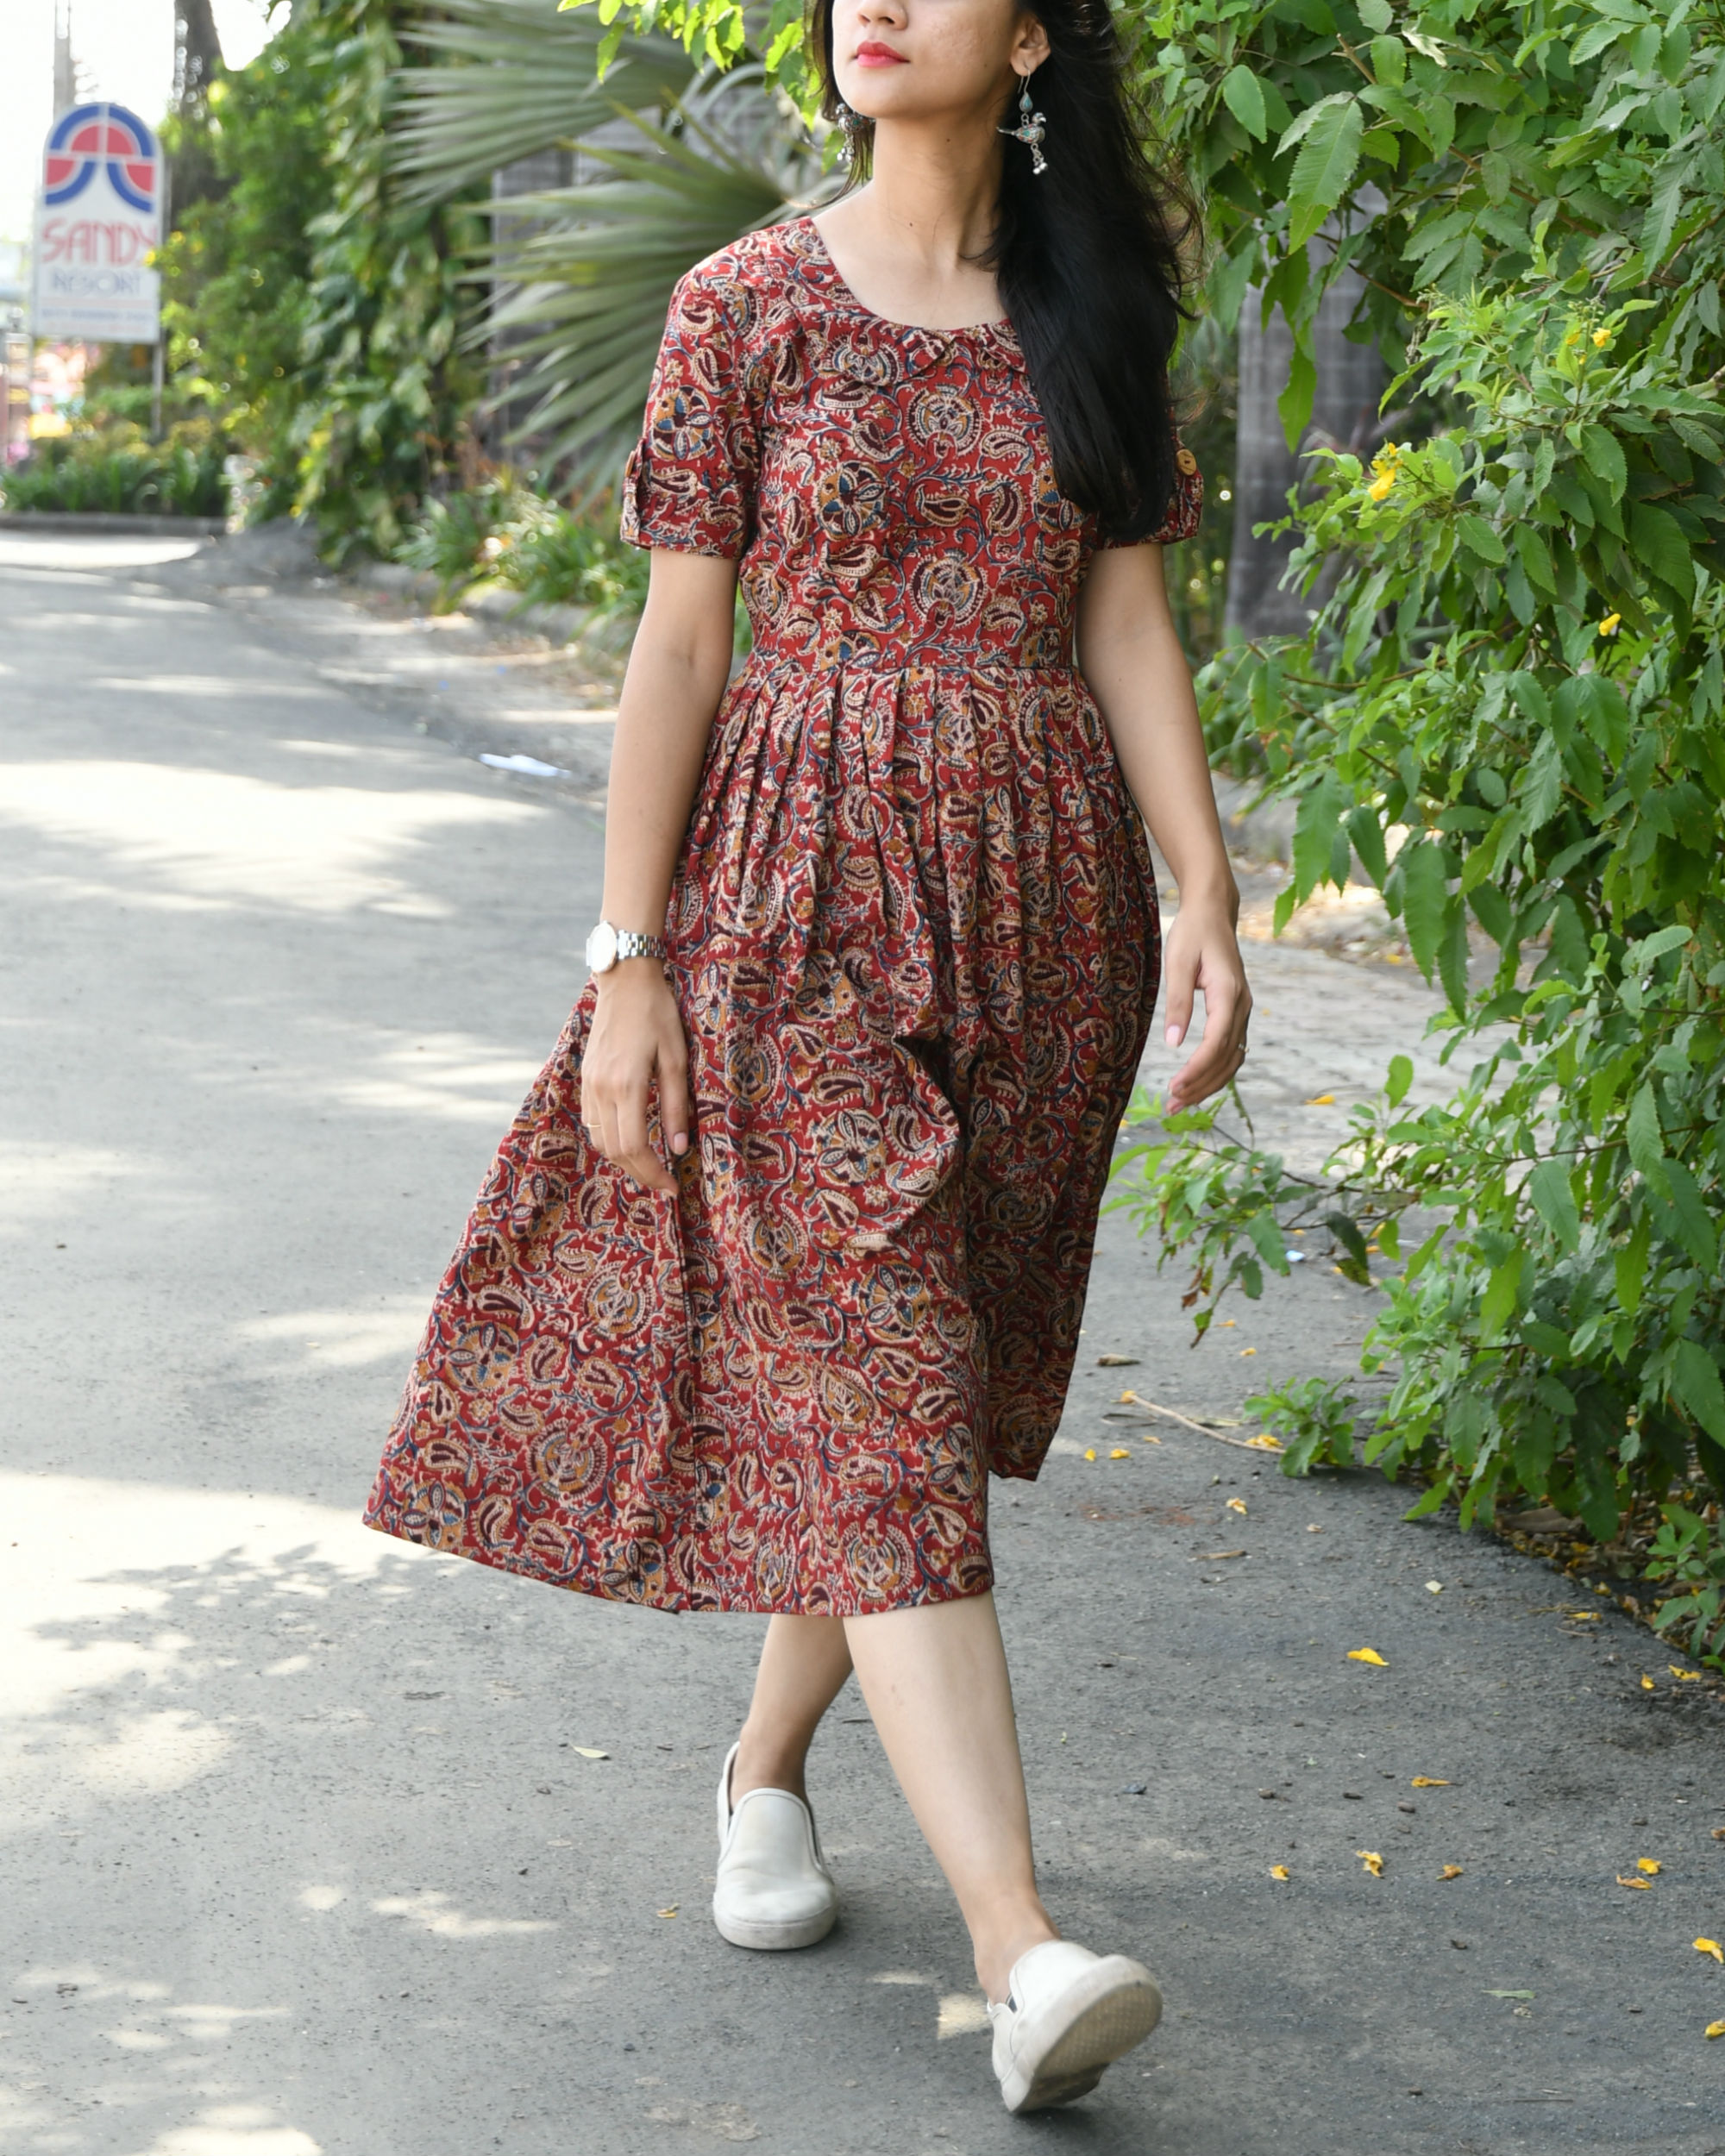 Maroon kalamkari dress